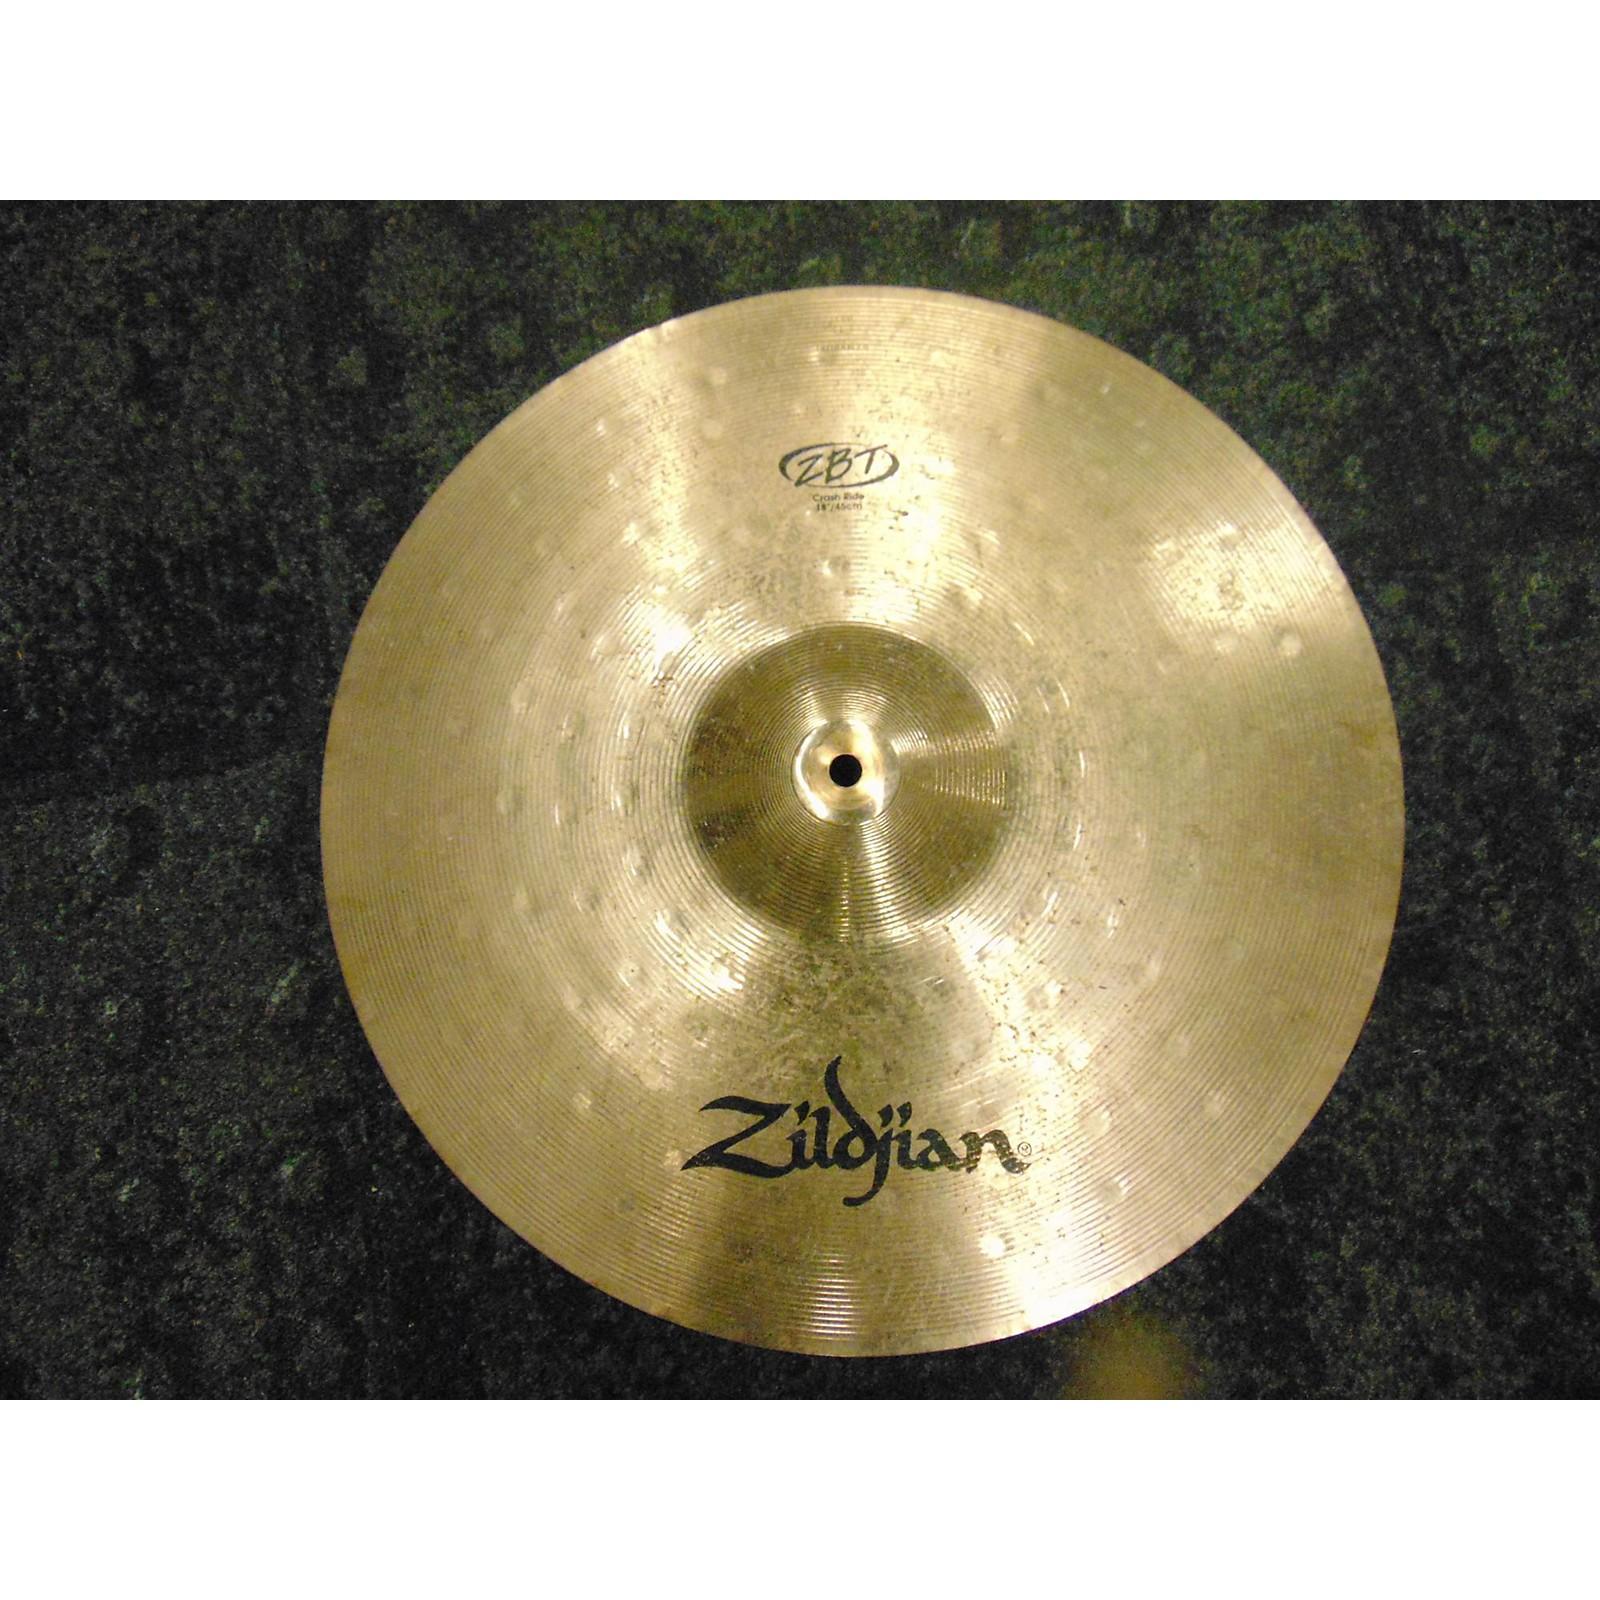 Zildjian 2000s 18in ZBT Crash Ride Cymbal